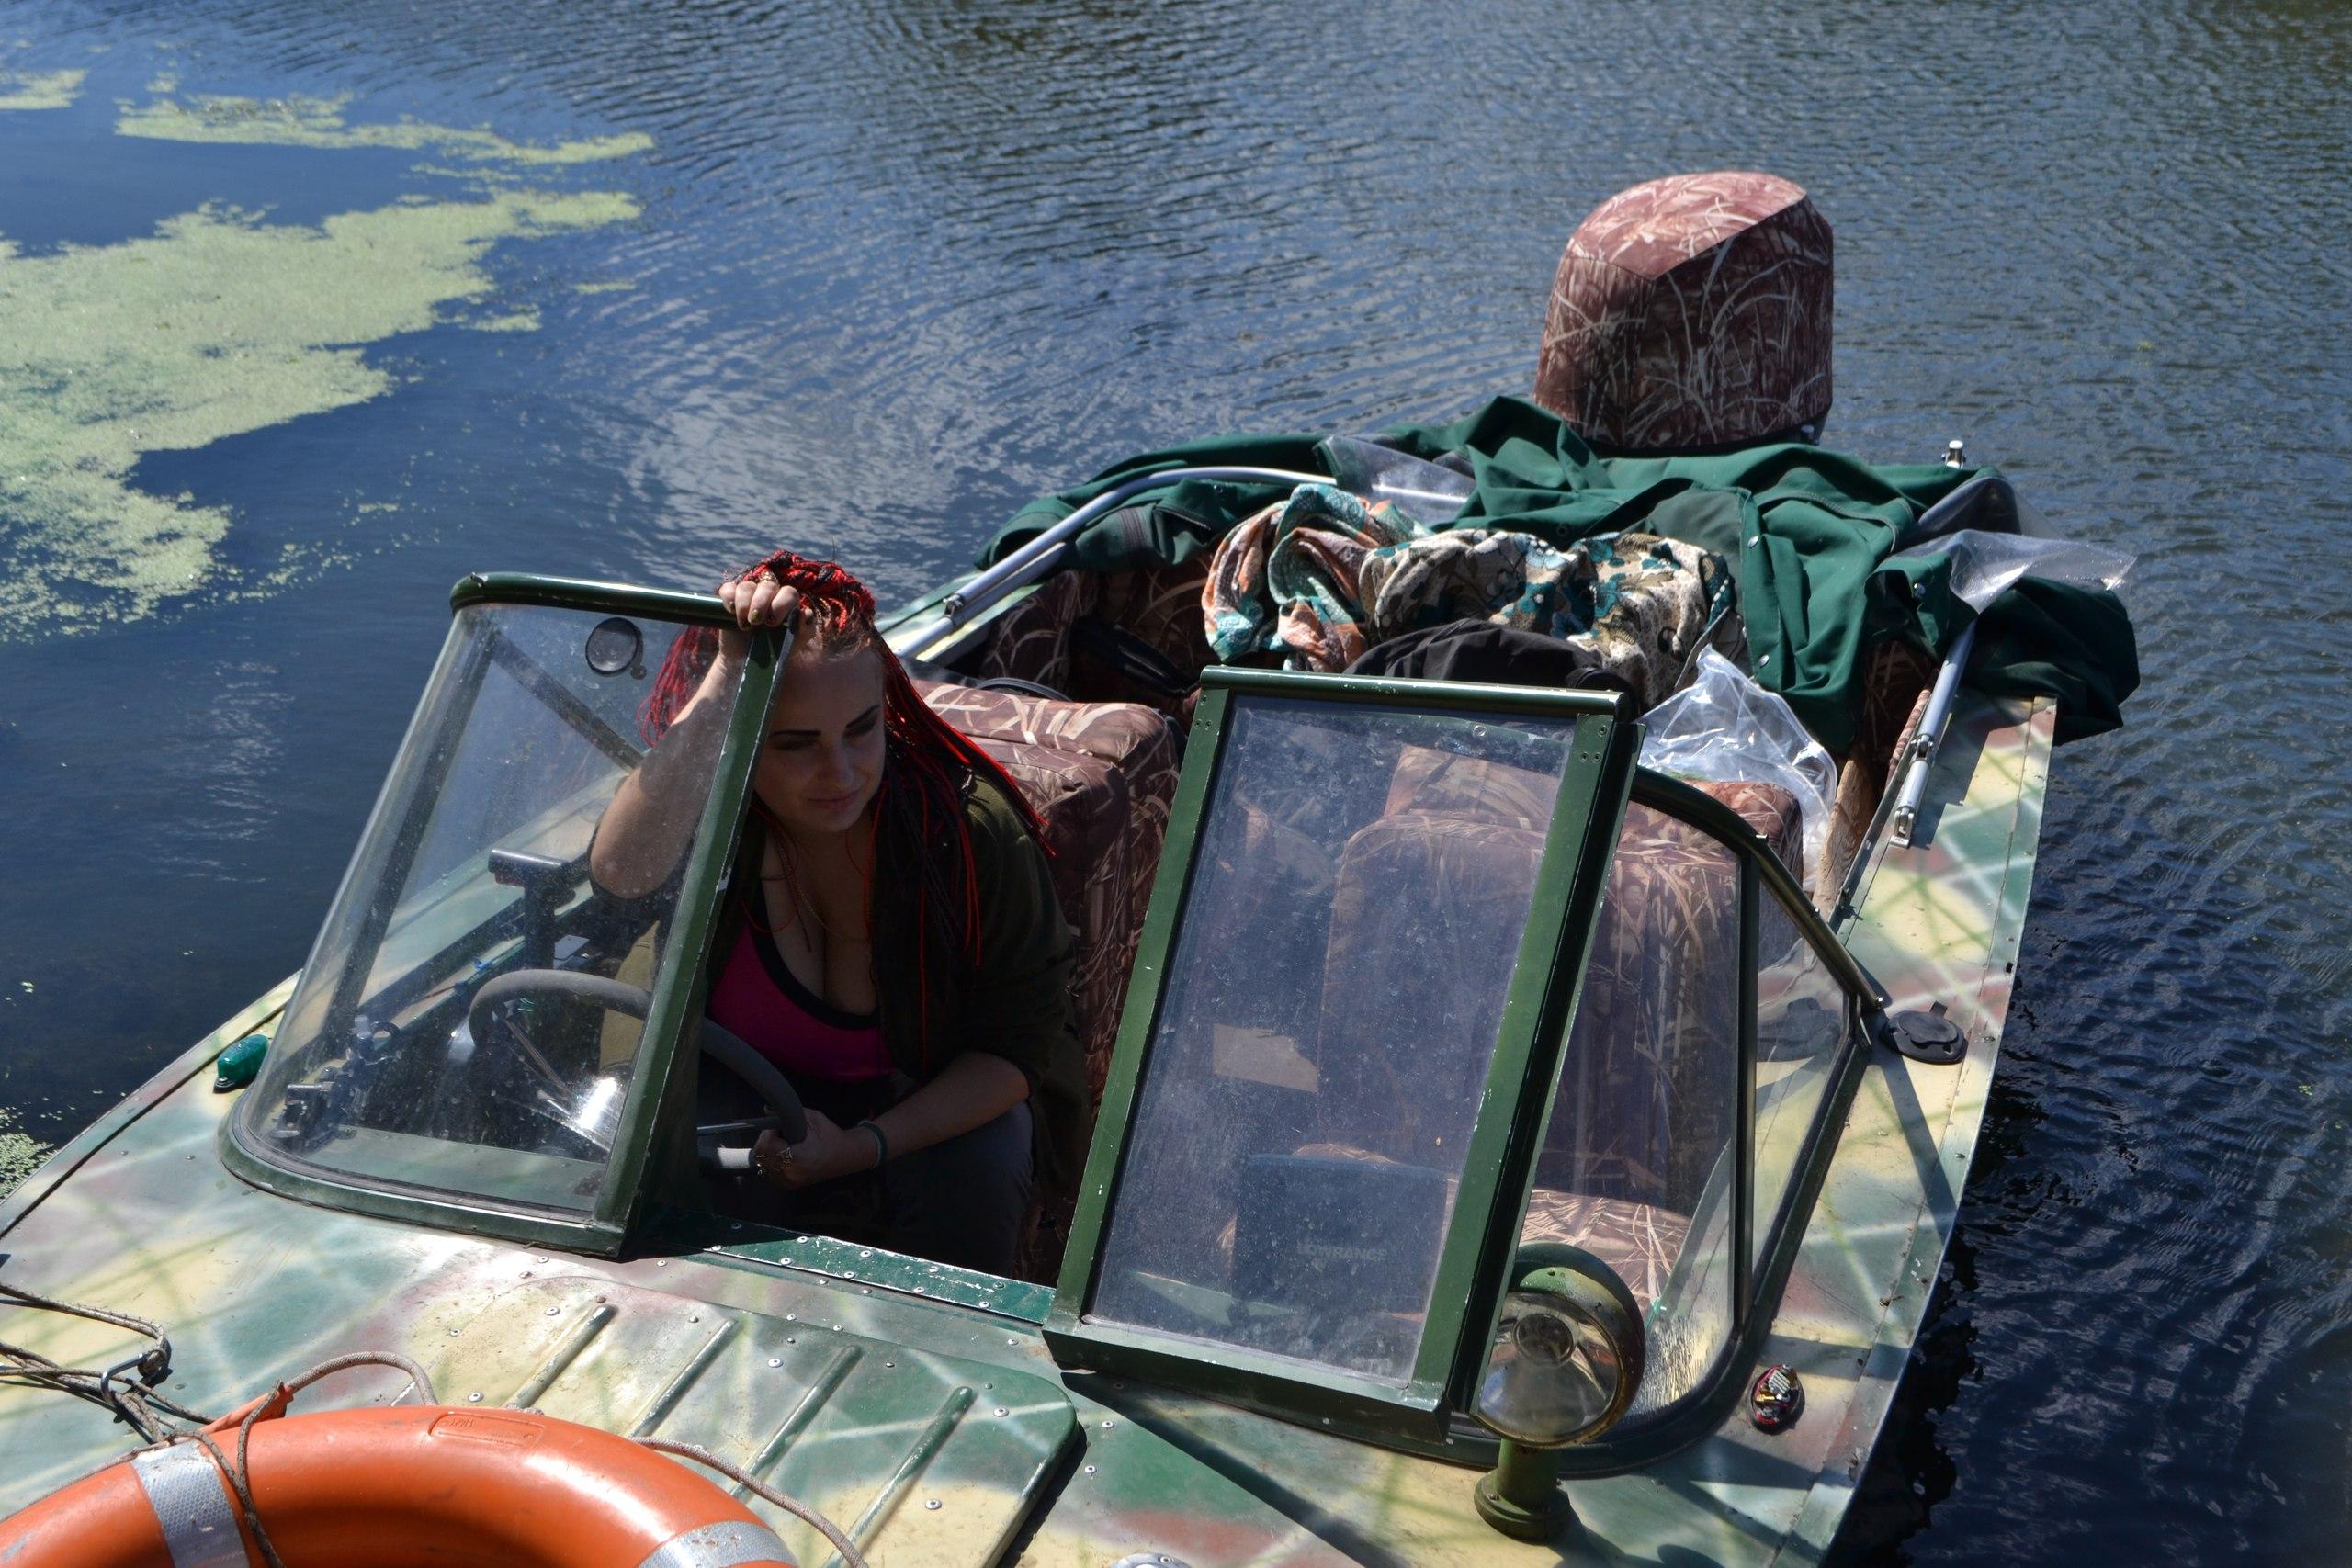 Елена Руденко Охота на водоплавающую дичь ( Украинка. 24-25 августа. 2016 г.) - Страница 2 LpBKDdLZ5M8